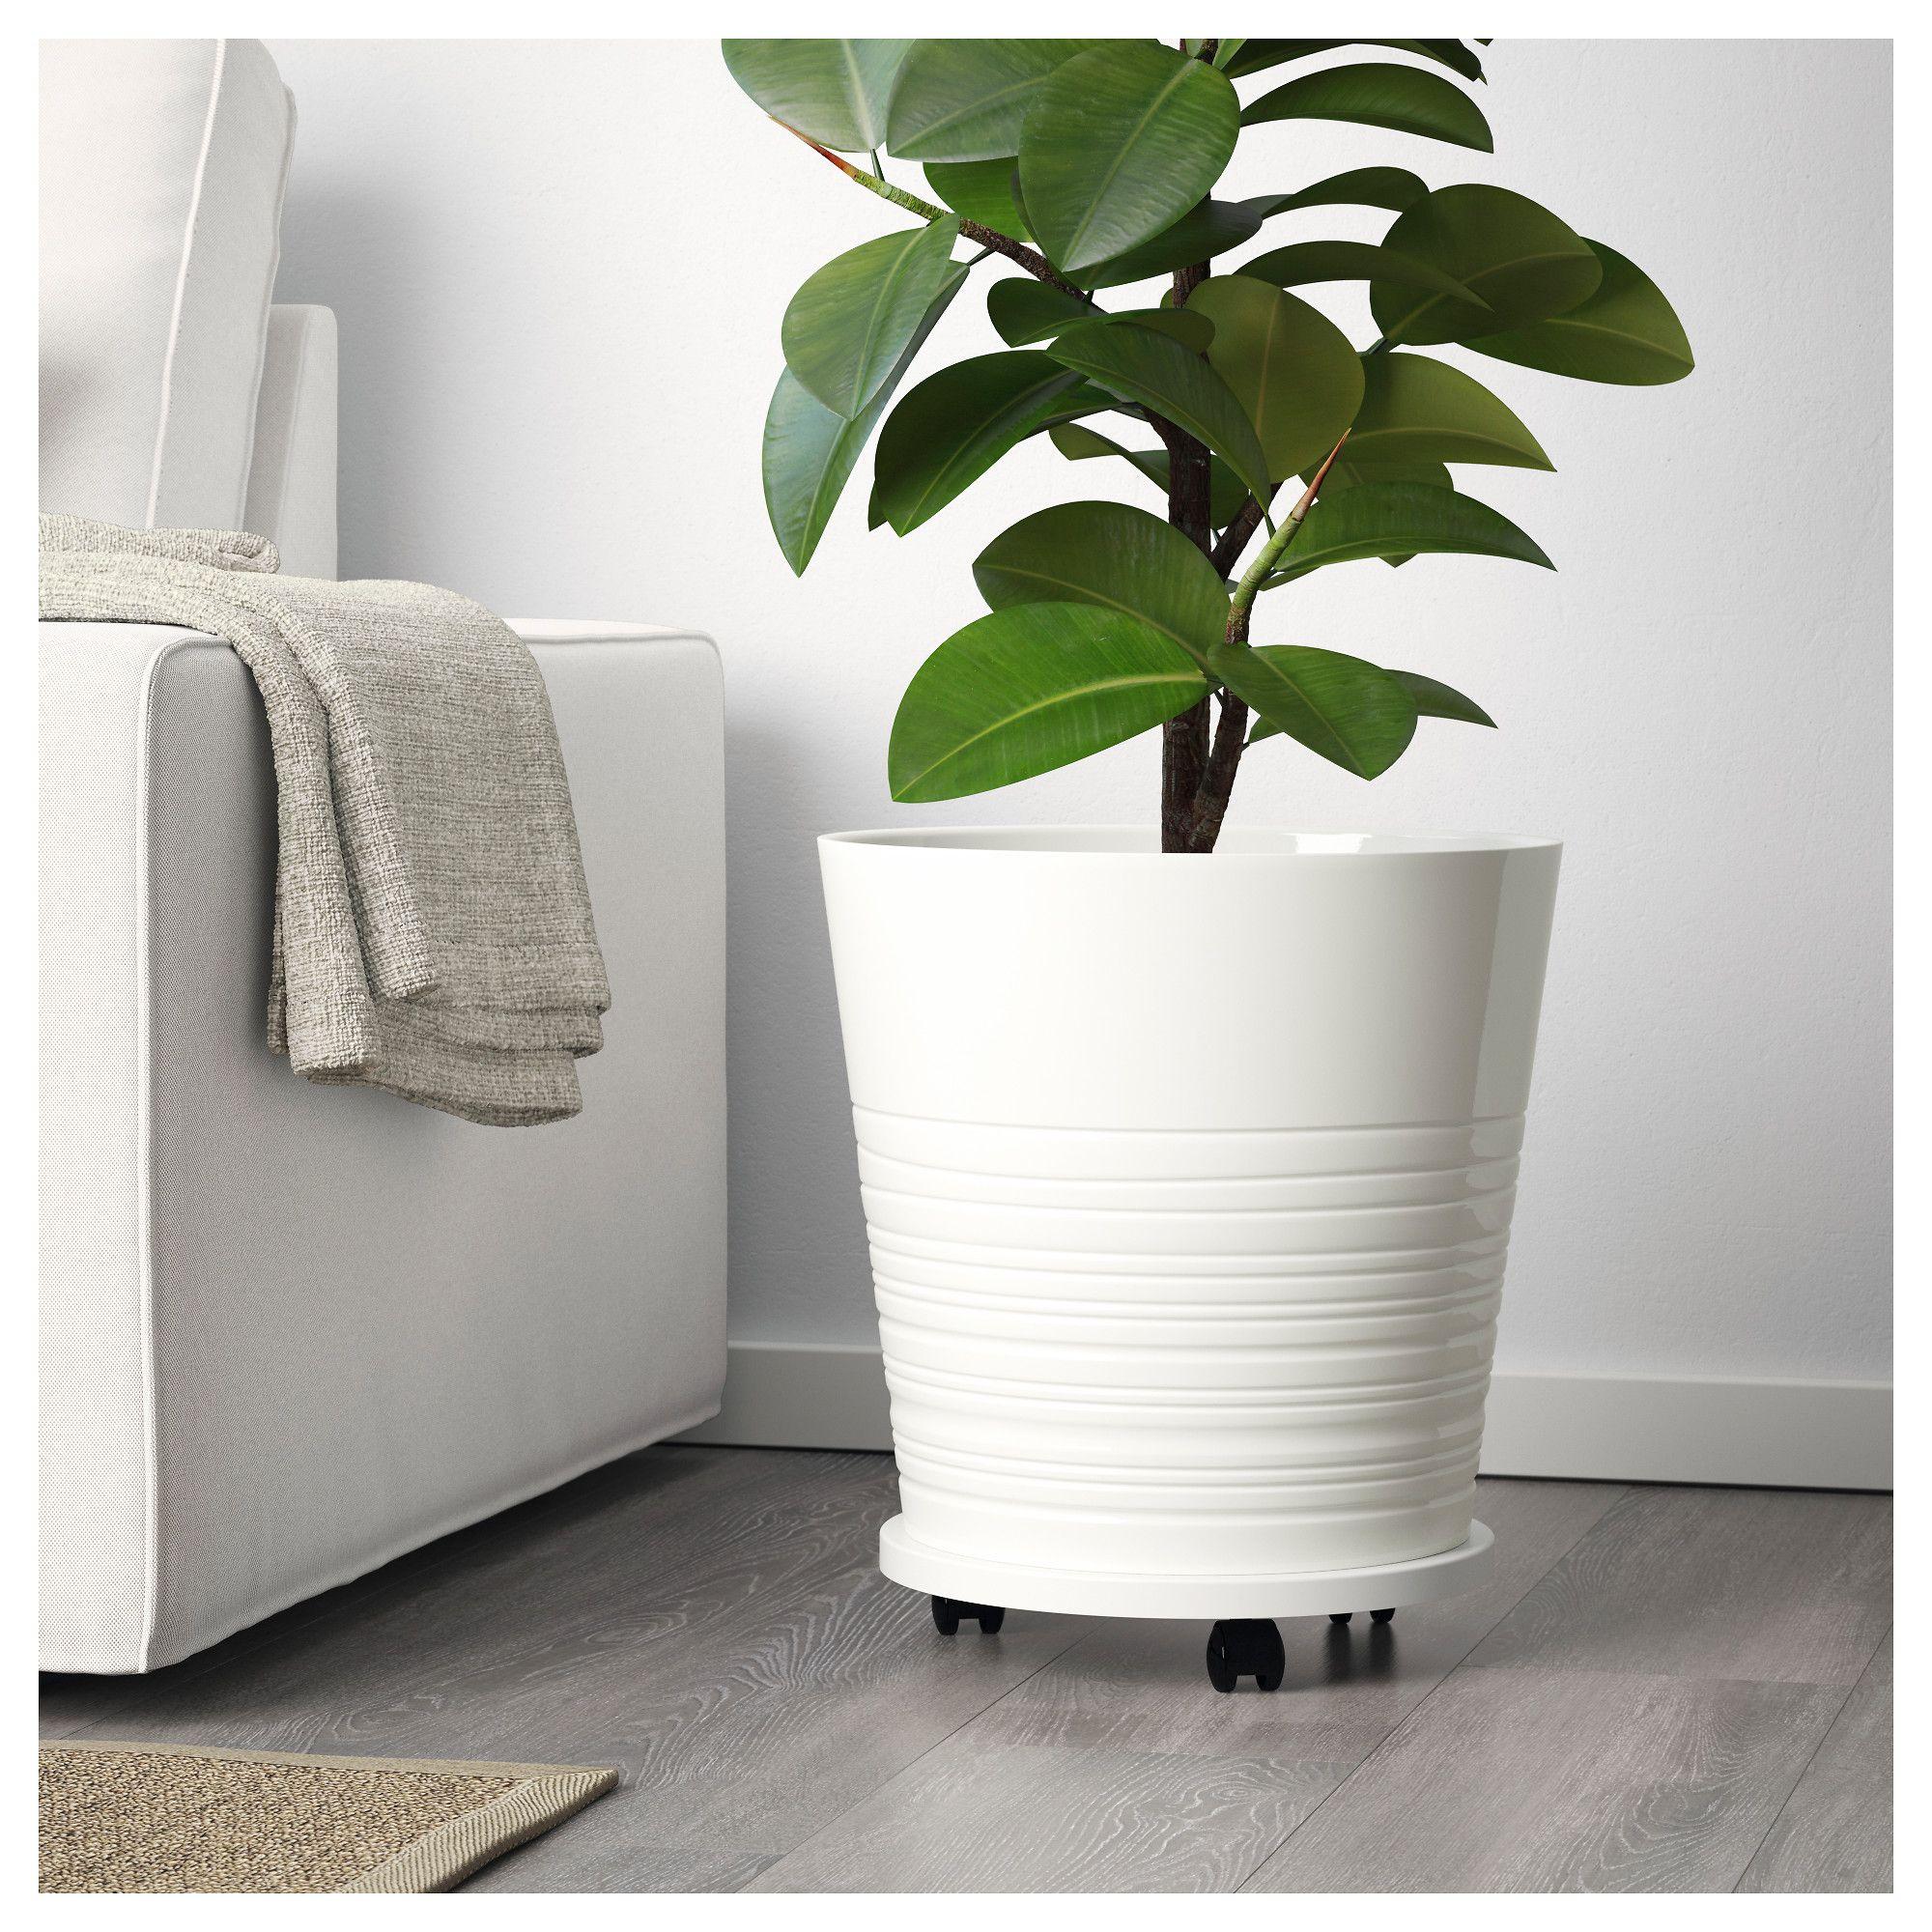 Ikea Muskot Plant Pot White